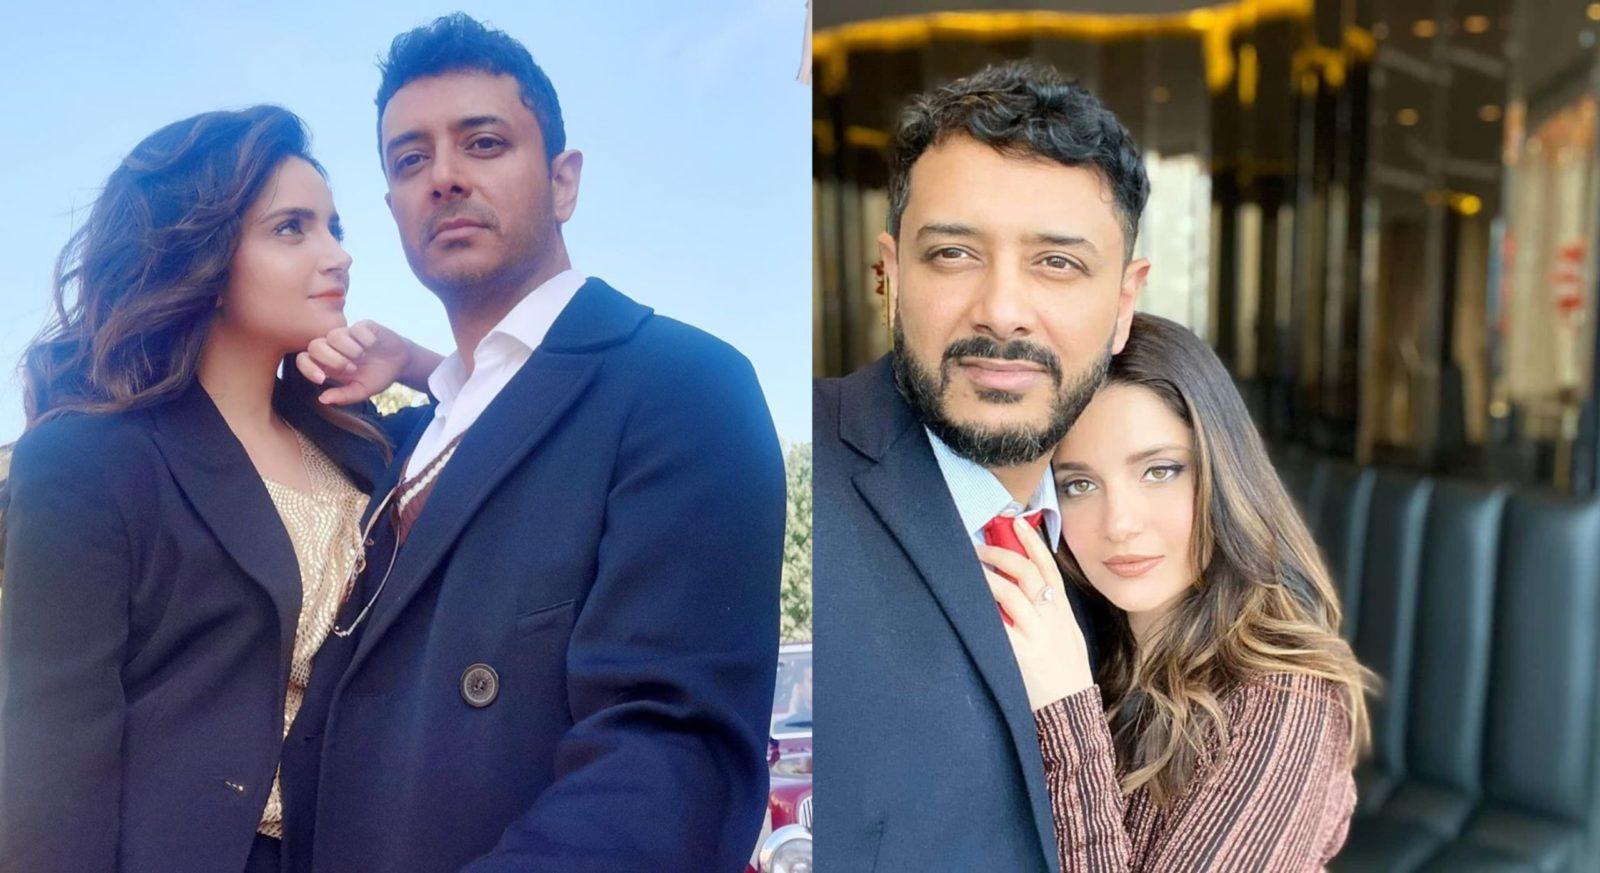 Armeena Khan Announces her Secret Marriage to Fiance Fesl Khan on Valentine's Day